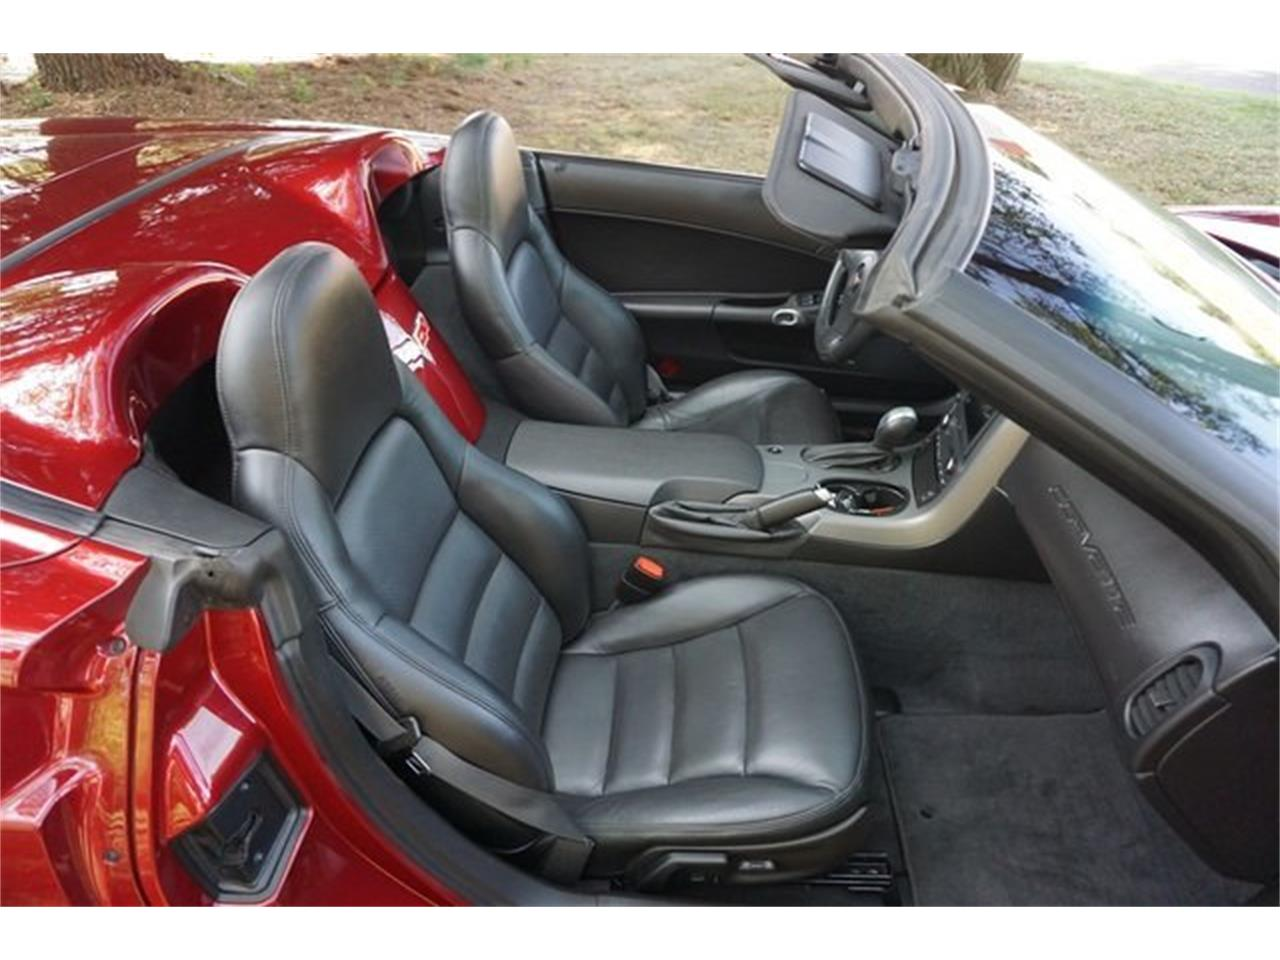 2007 Chevrolet Corvette (CC-1266138) for sale in Monroe, New Jersey